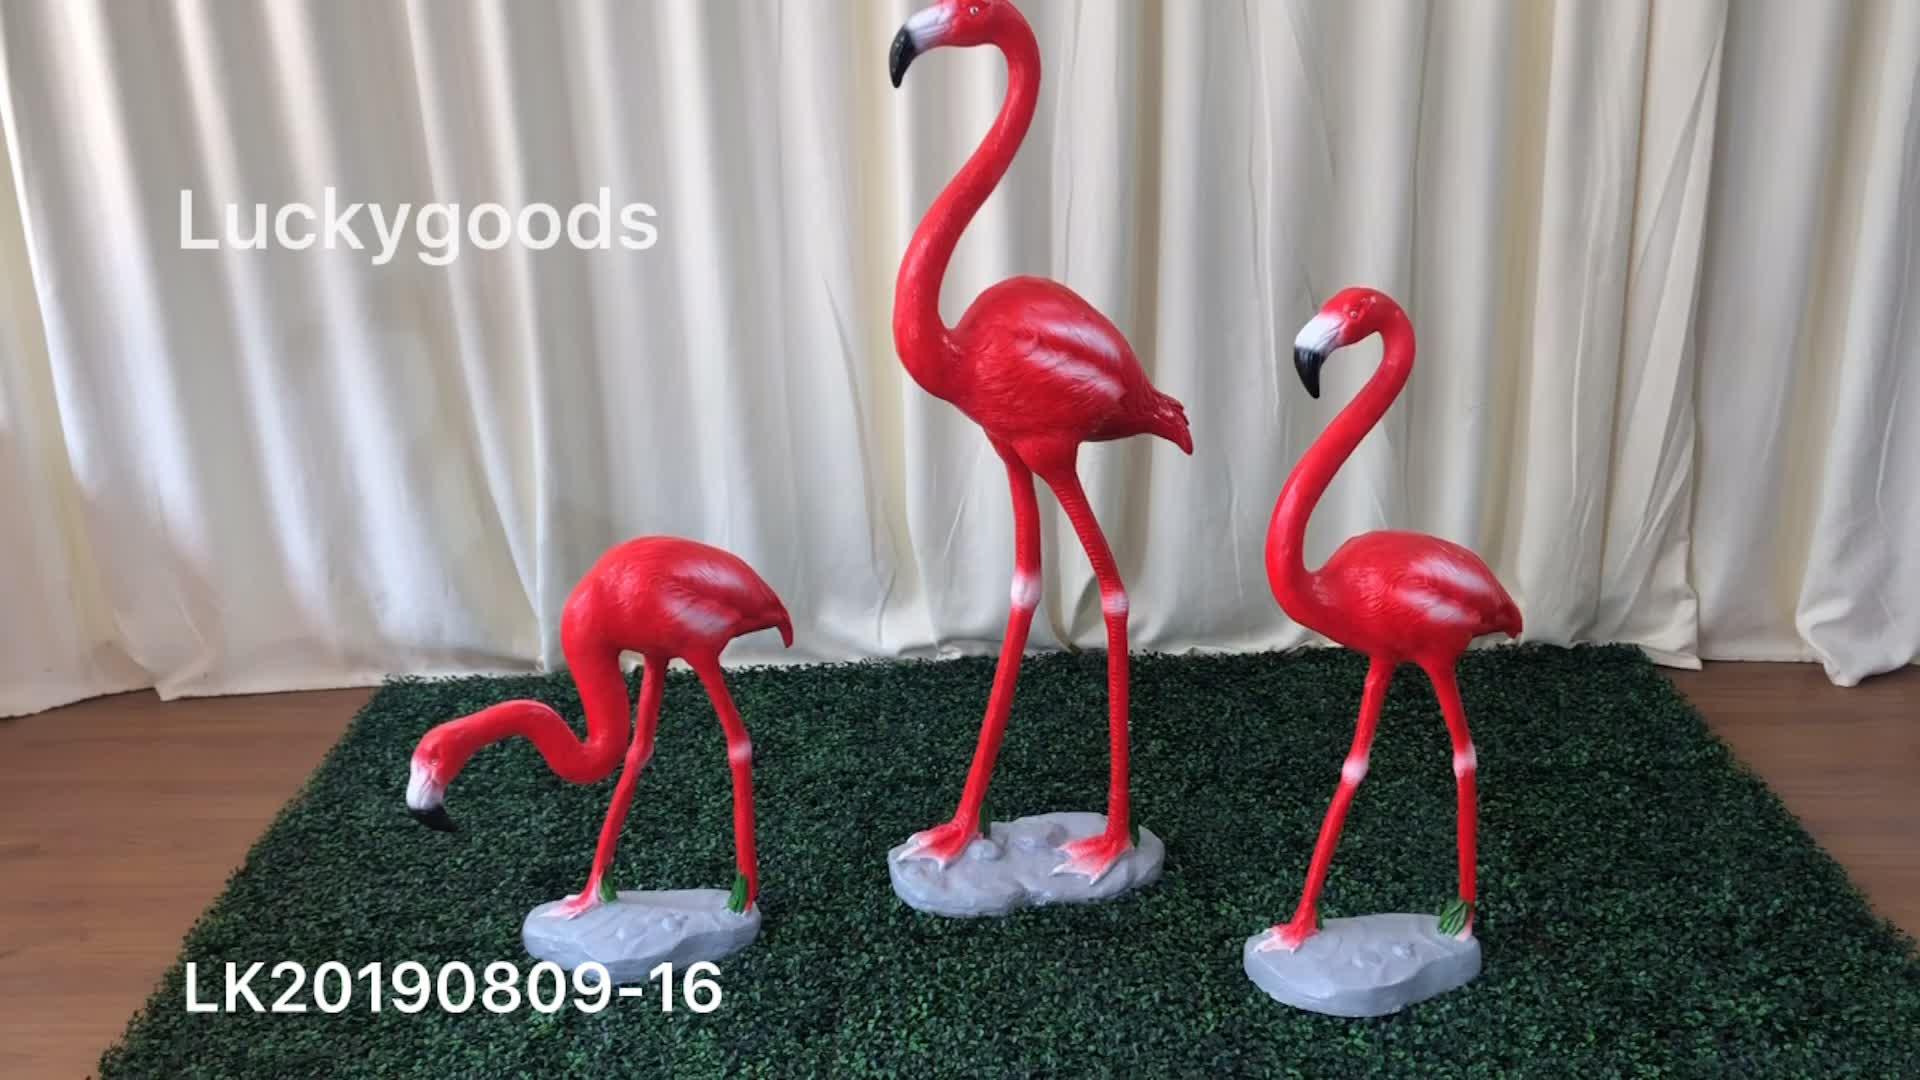 LK20190809-16 High Simulation Garden Decoration Flamingo Artificial Animal for Home Decor